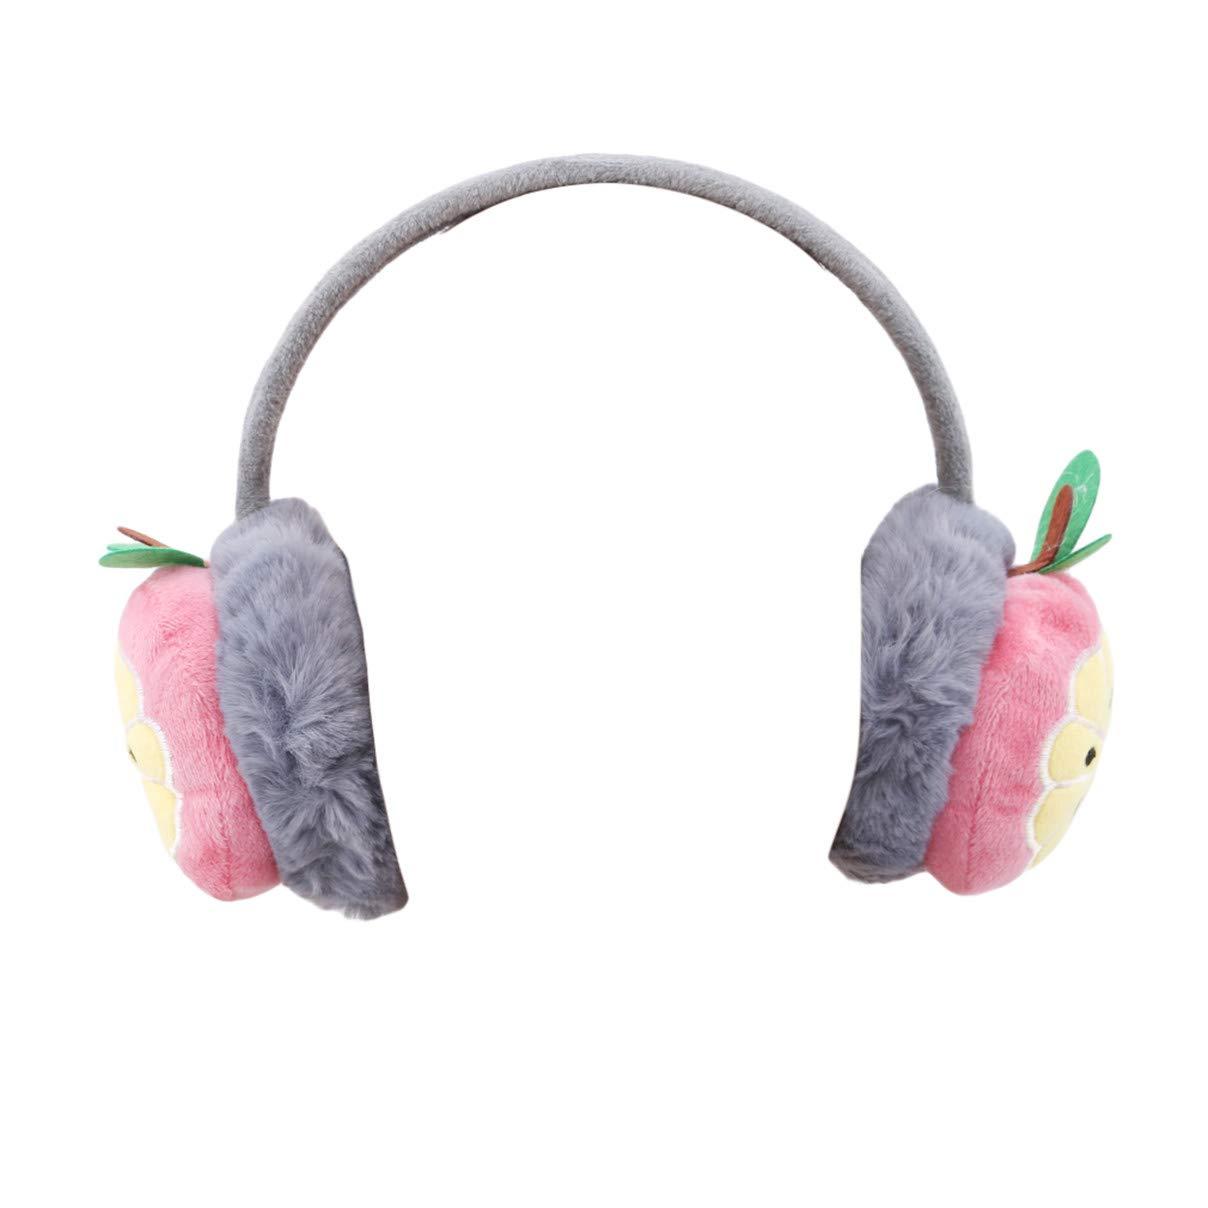 Danzh Ear Muff Kids Adjustable Cartoon Fruits Winter Warm Earmuffs Ear Cover Headband Gift For Children